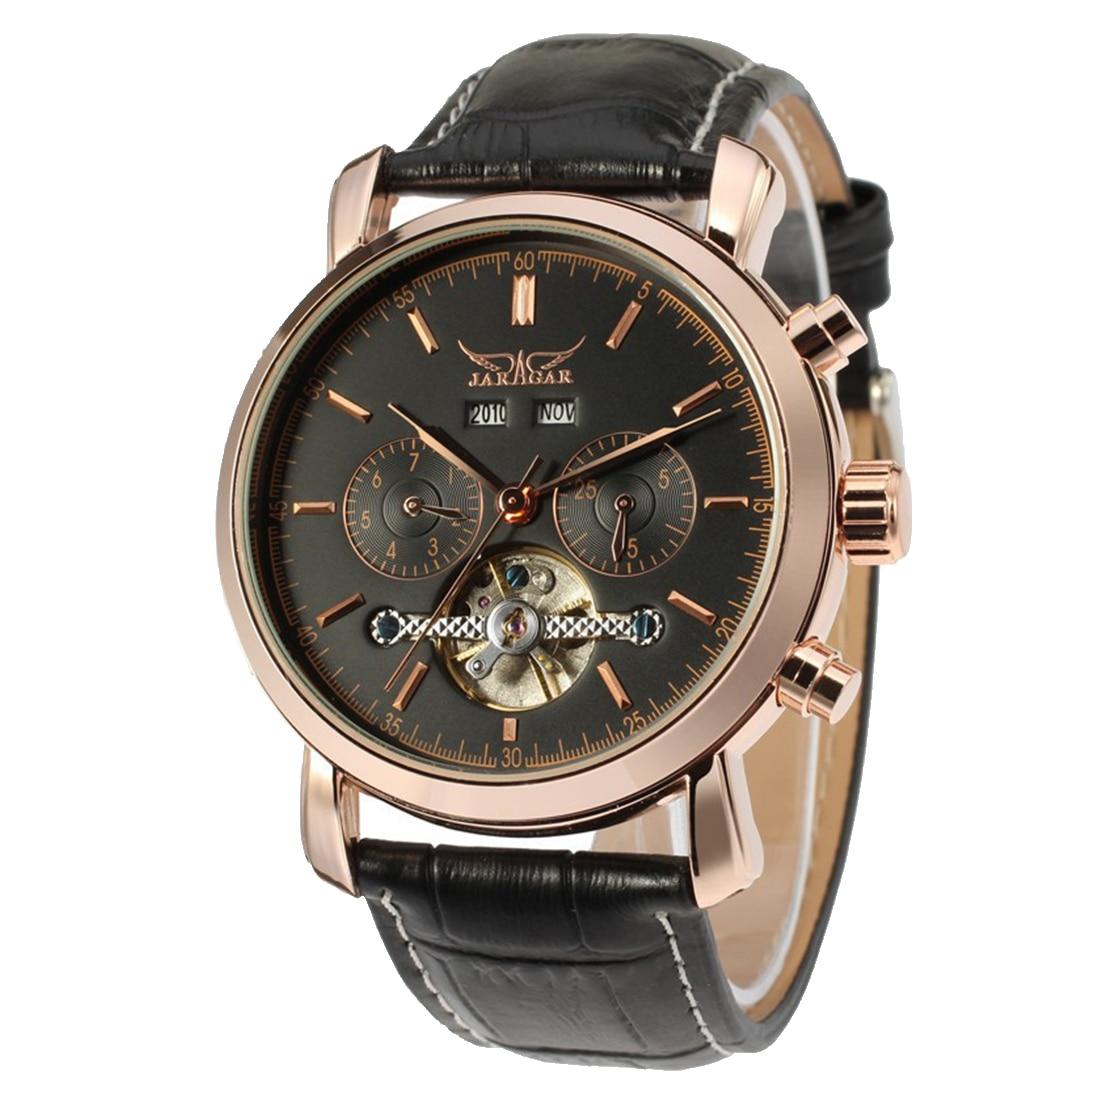 2017 Nice Hot Nice JARGAR Genuine Flywheel Wristwatch with Leather Band Mechanical Watch for Men цены онлайн